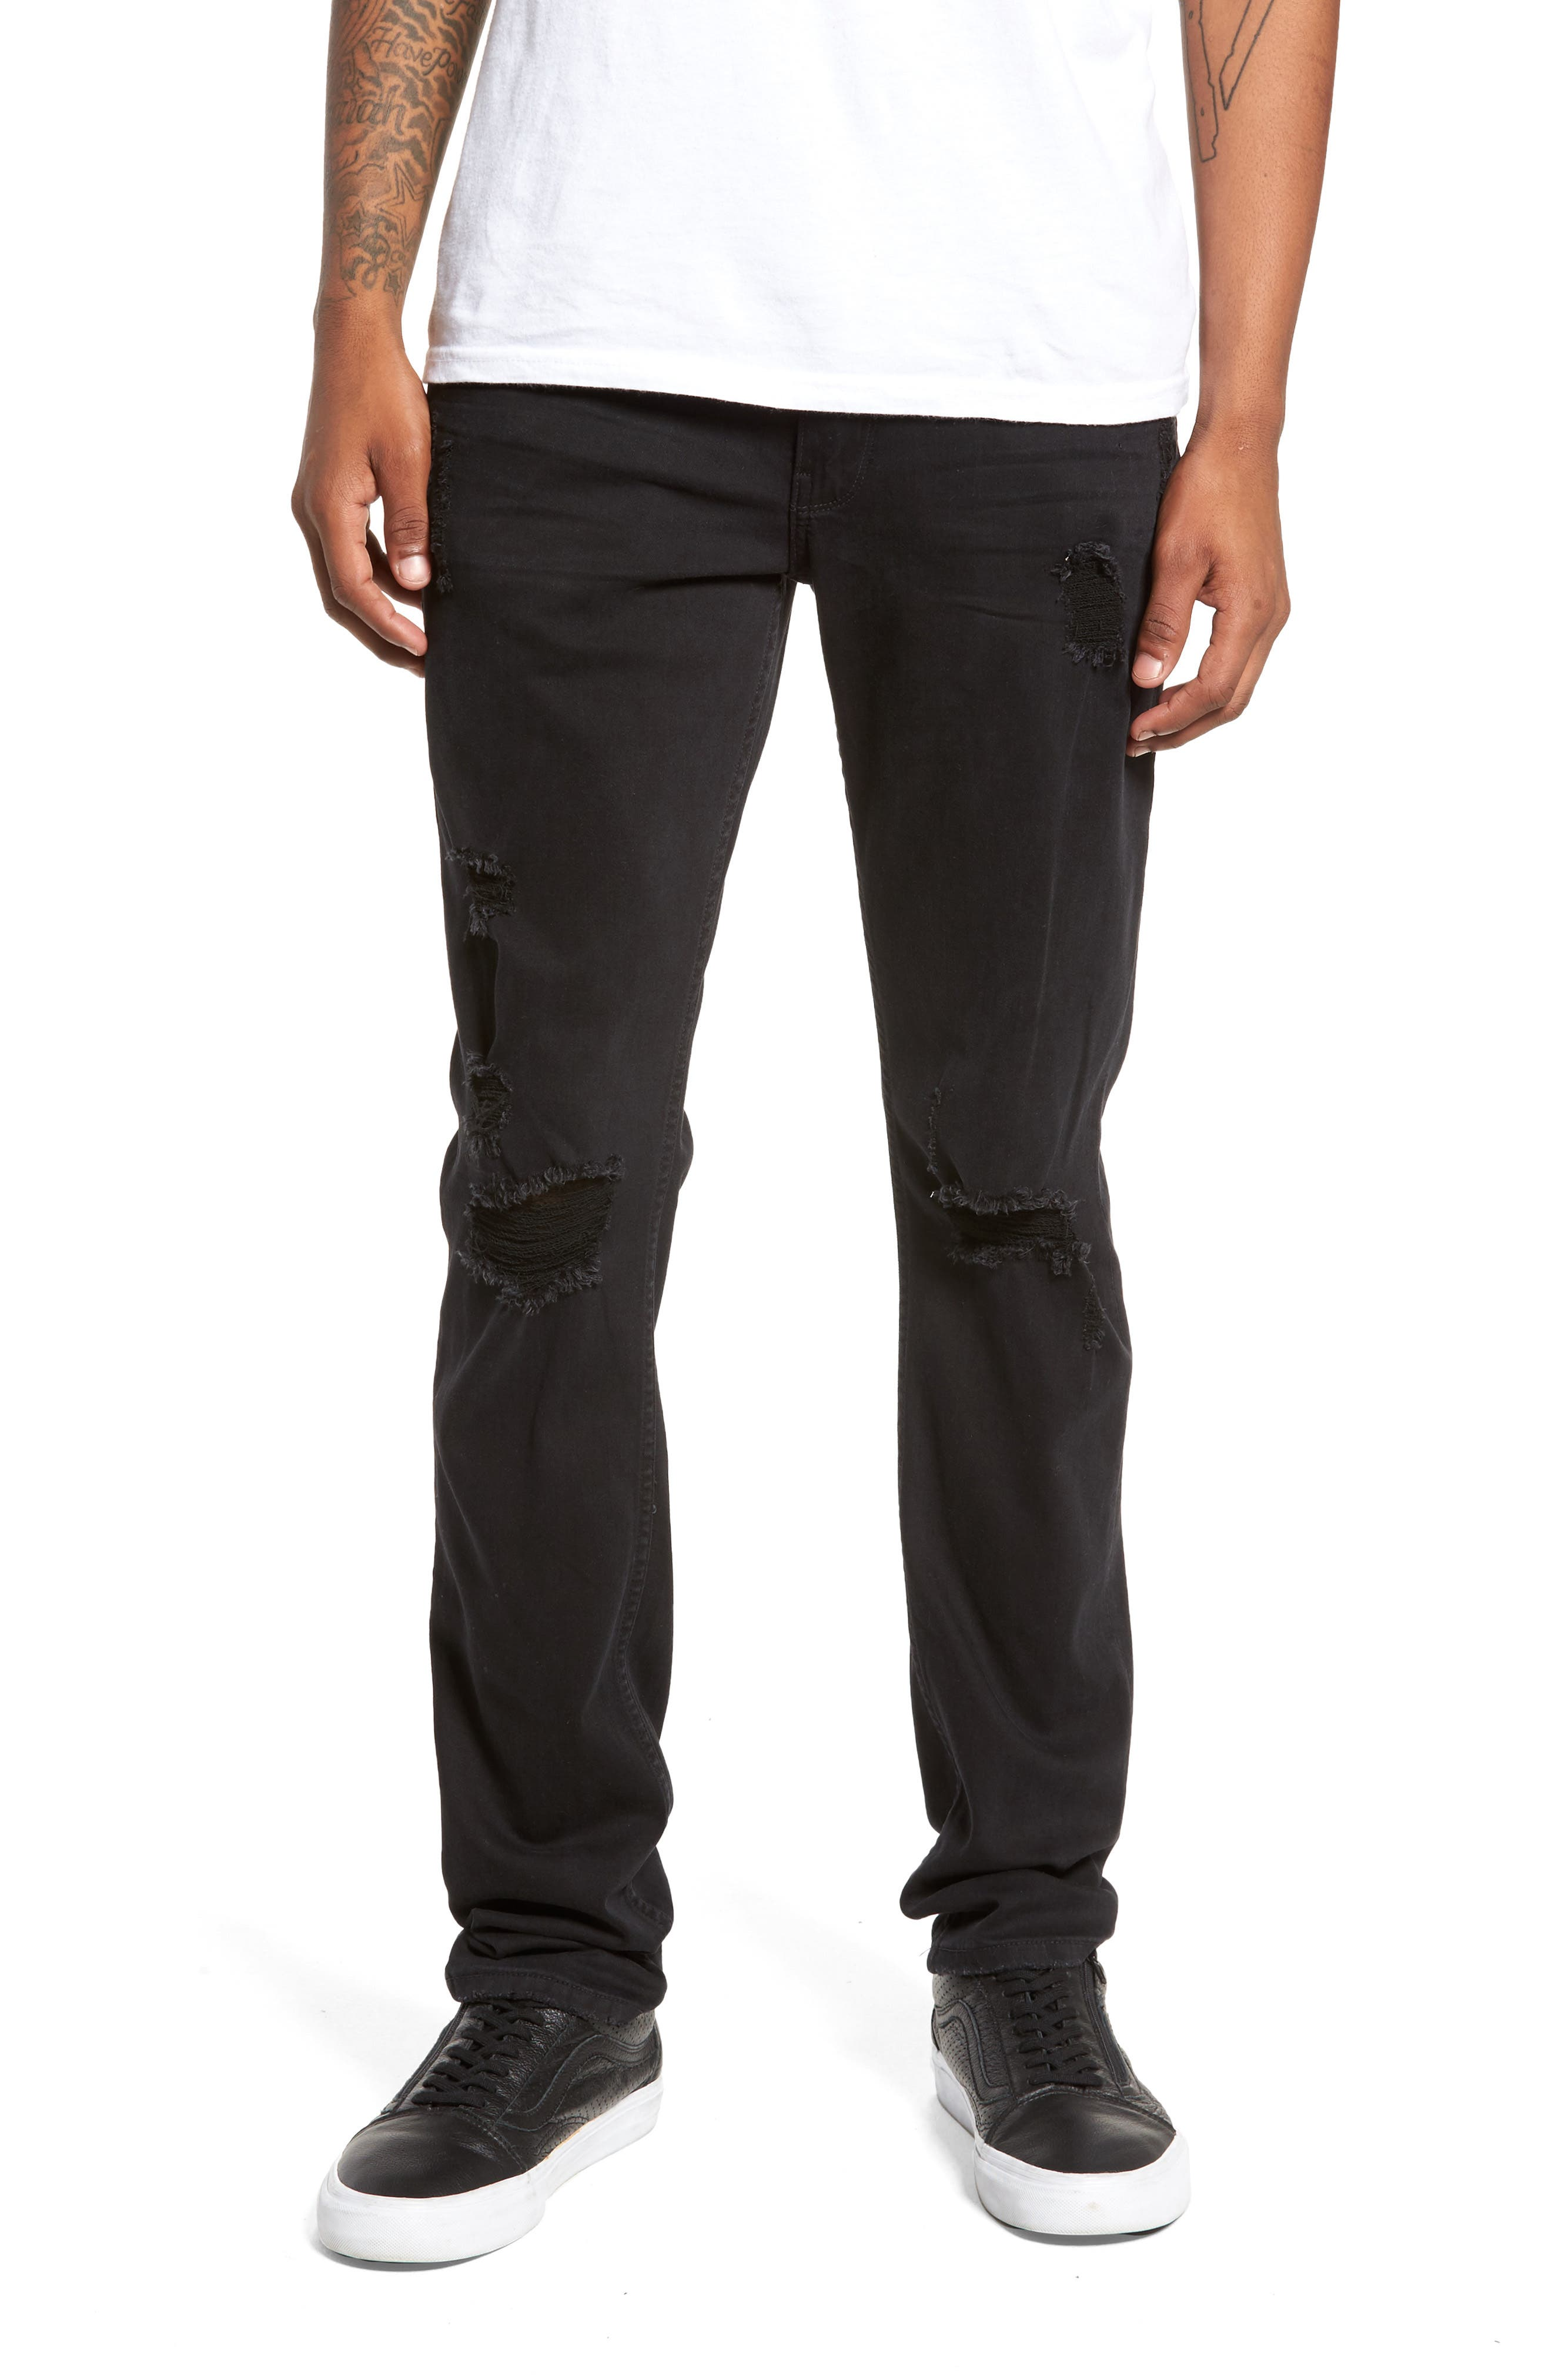 Transcend - Croft Skinny Fit Jeans,                             Main thumbnail 1, color,                             ADAM DESTRUCTED